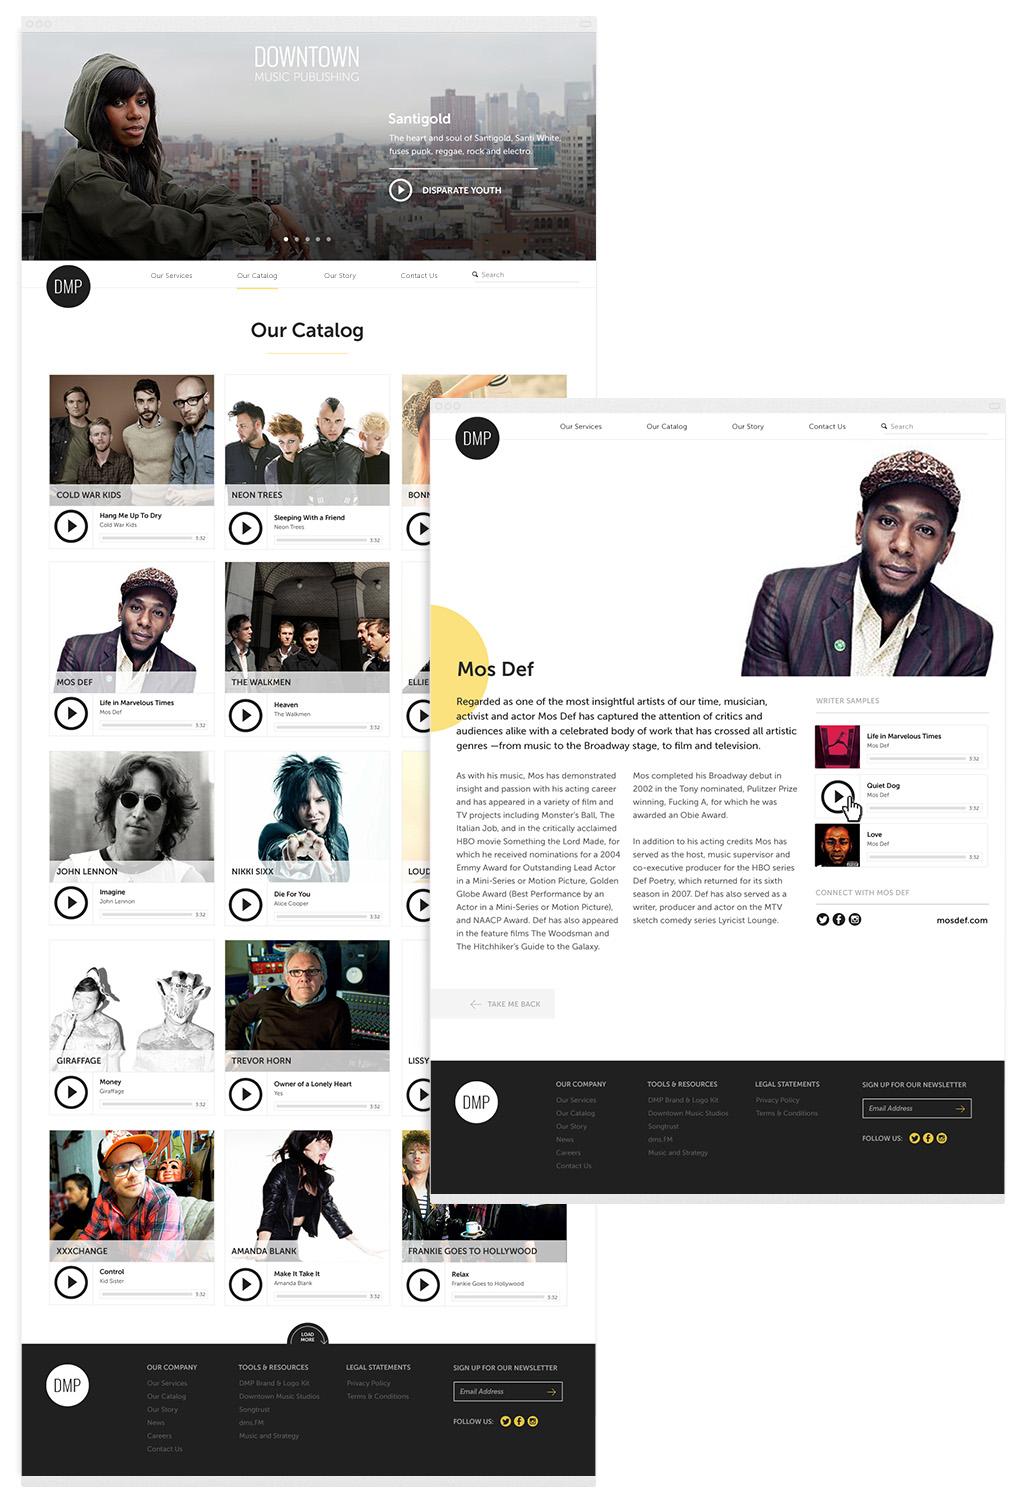 zmaic-downtown-music-publishing-dmp_responsive-web-design-strategy-music-catalog-roster-artists.jpg